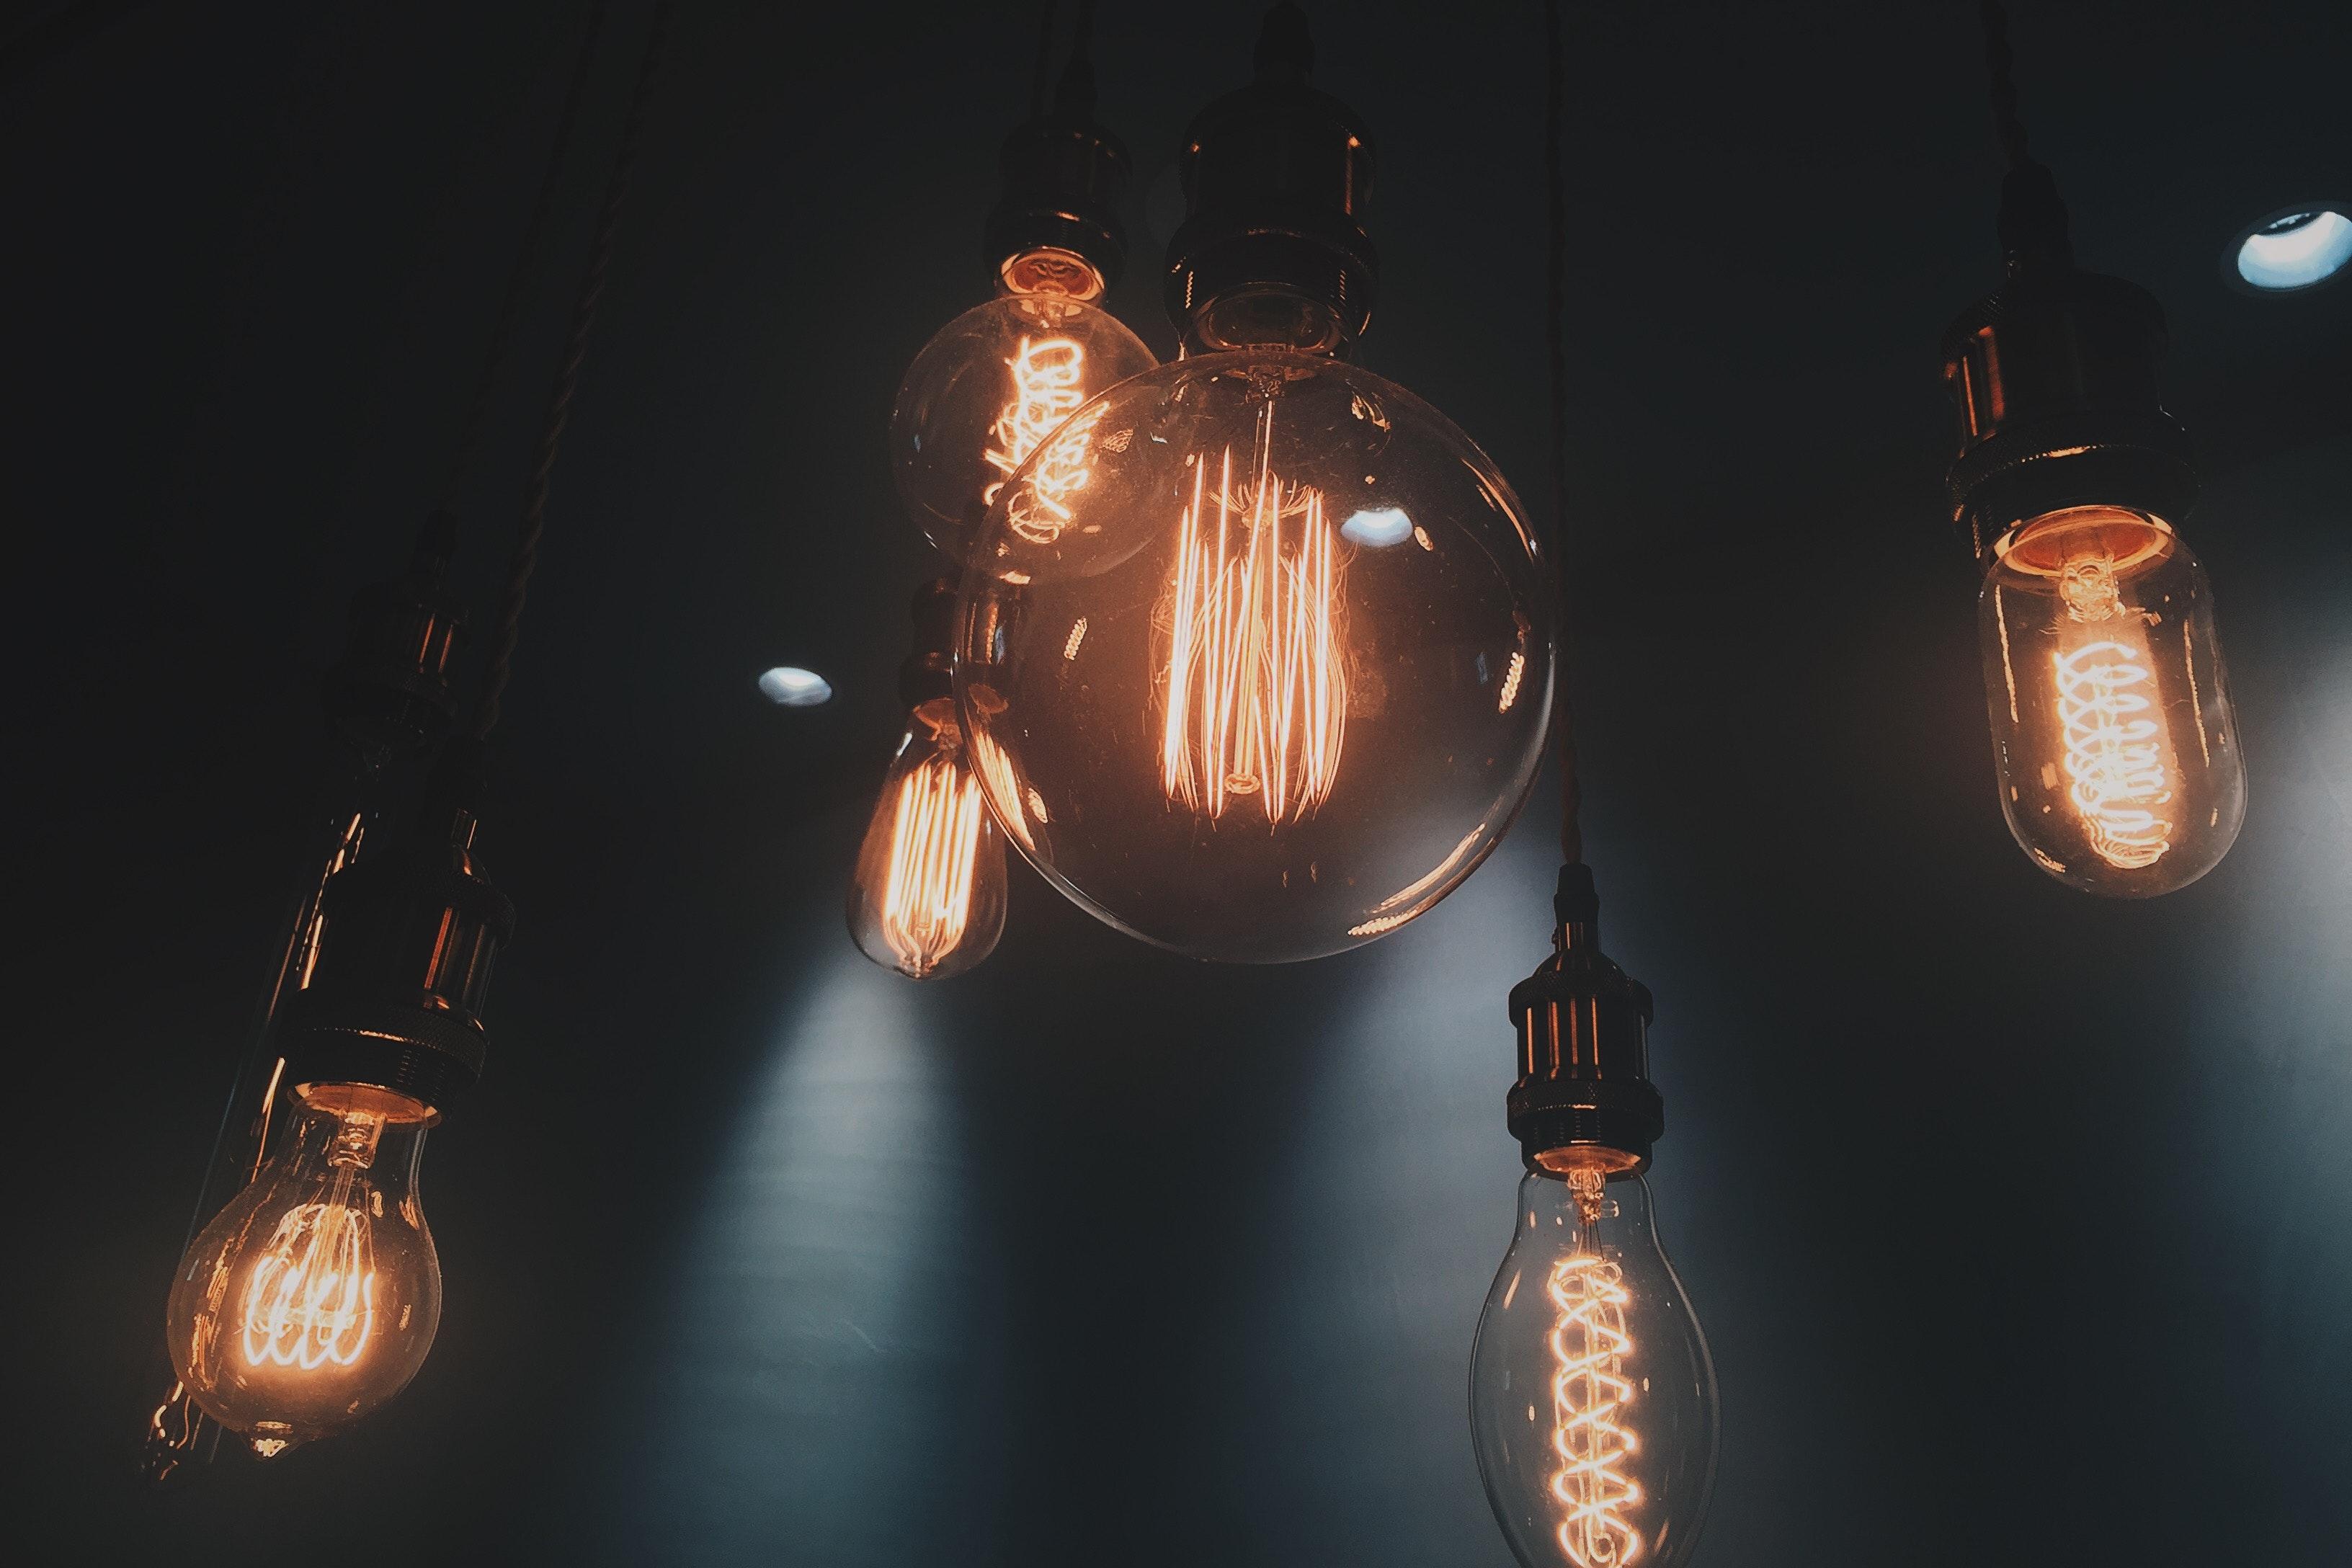 tripod photography photo tent lighting stands studio kit lights bulbs light with